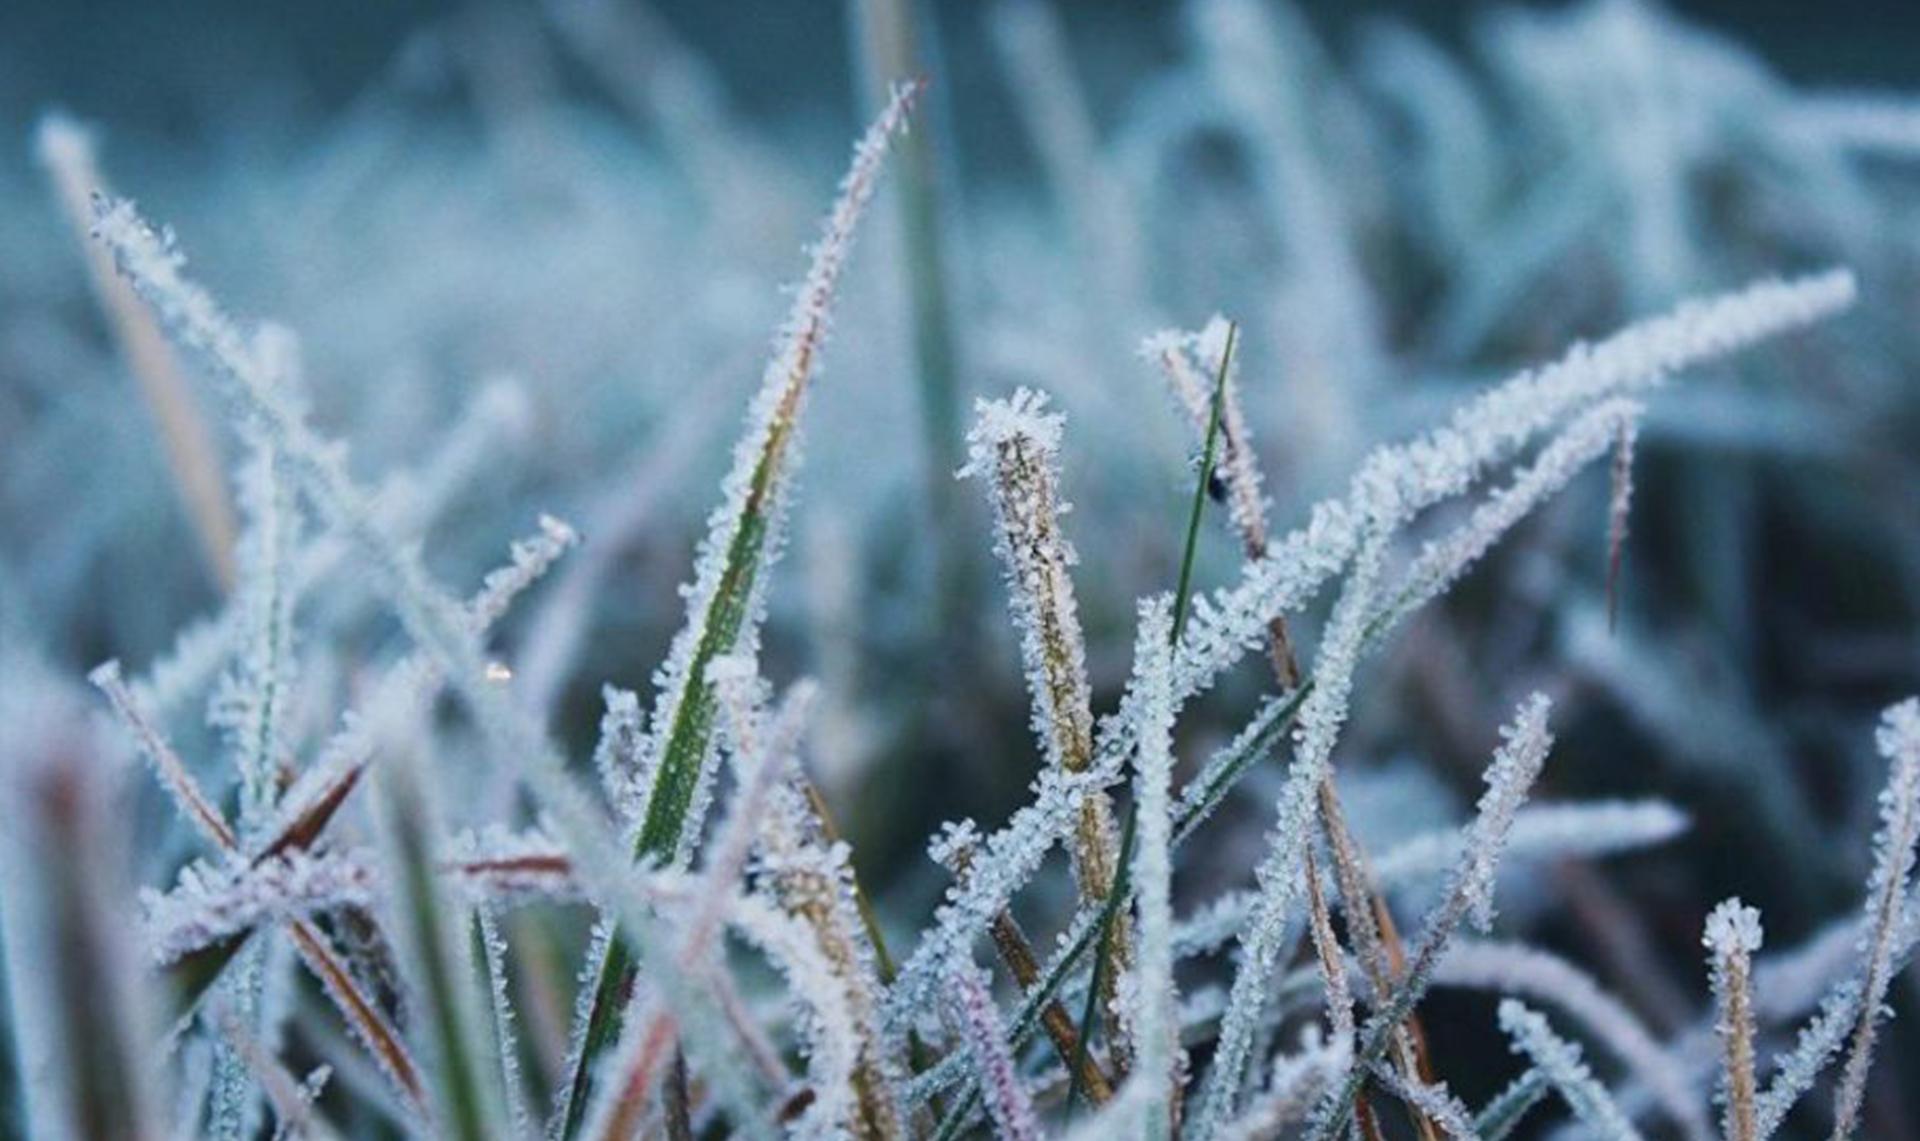 Заморозки прогнозируют в ряде районов Якутии 29 августа